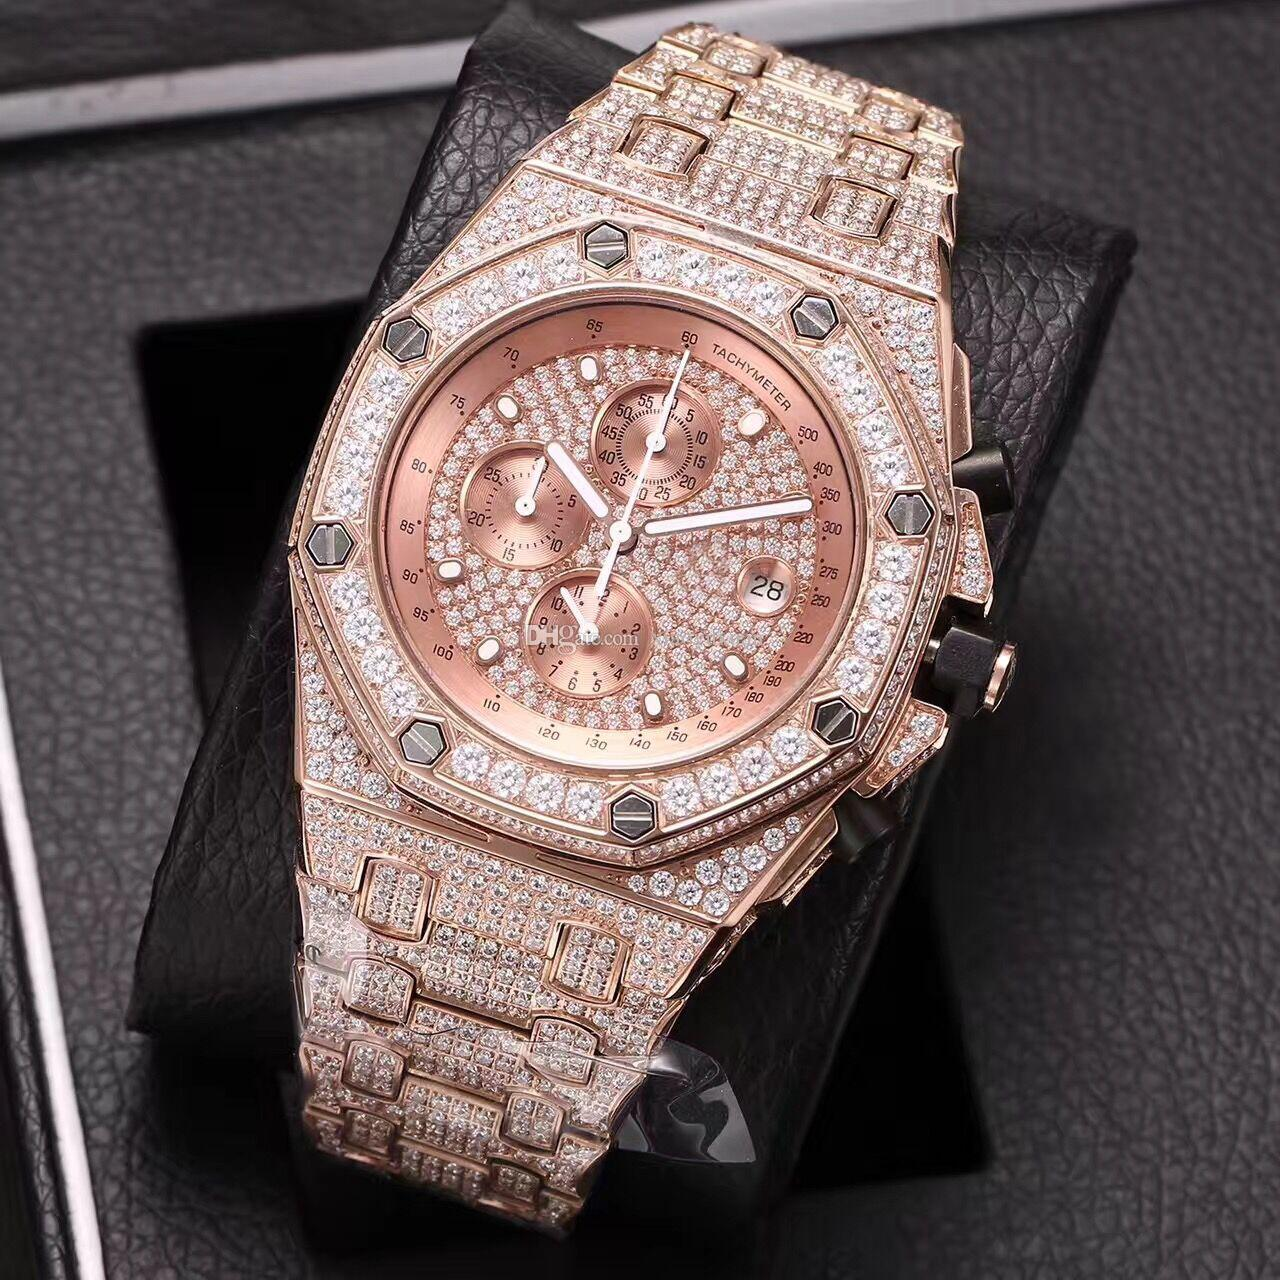 2018 New Full Diamond Watch Silver Black Face Gold Men S Watch